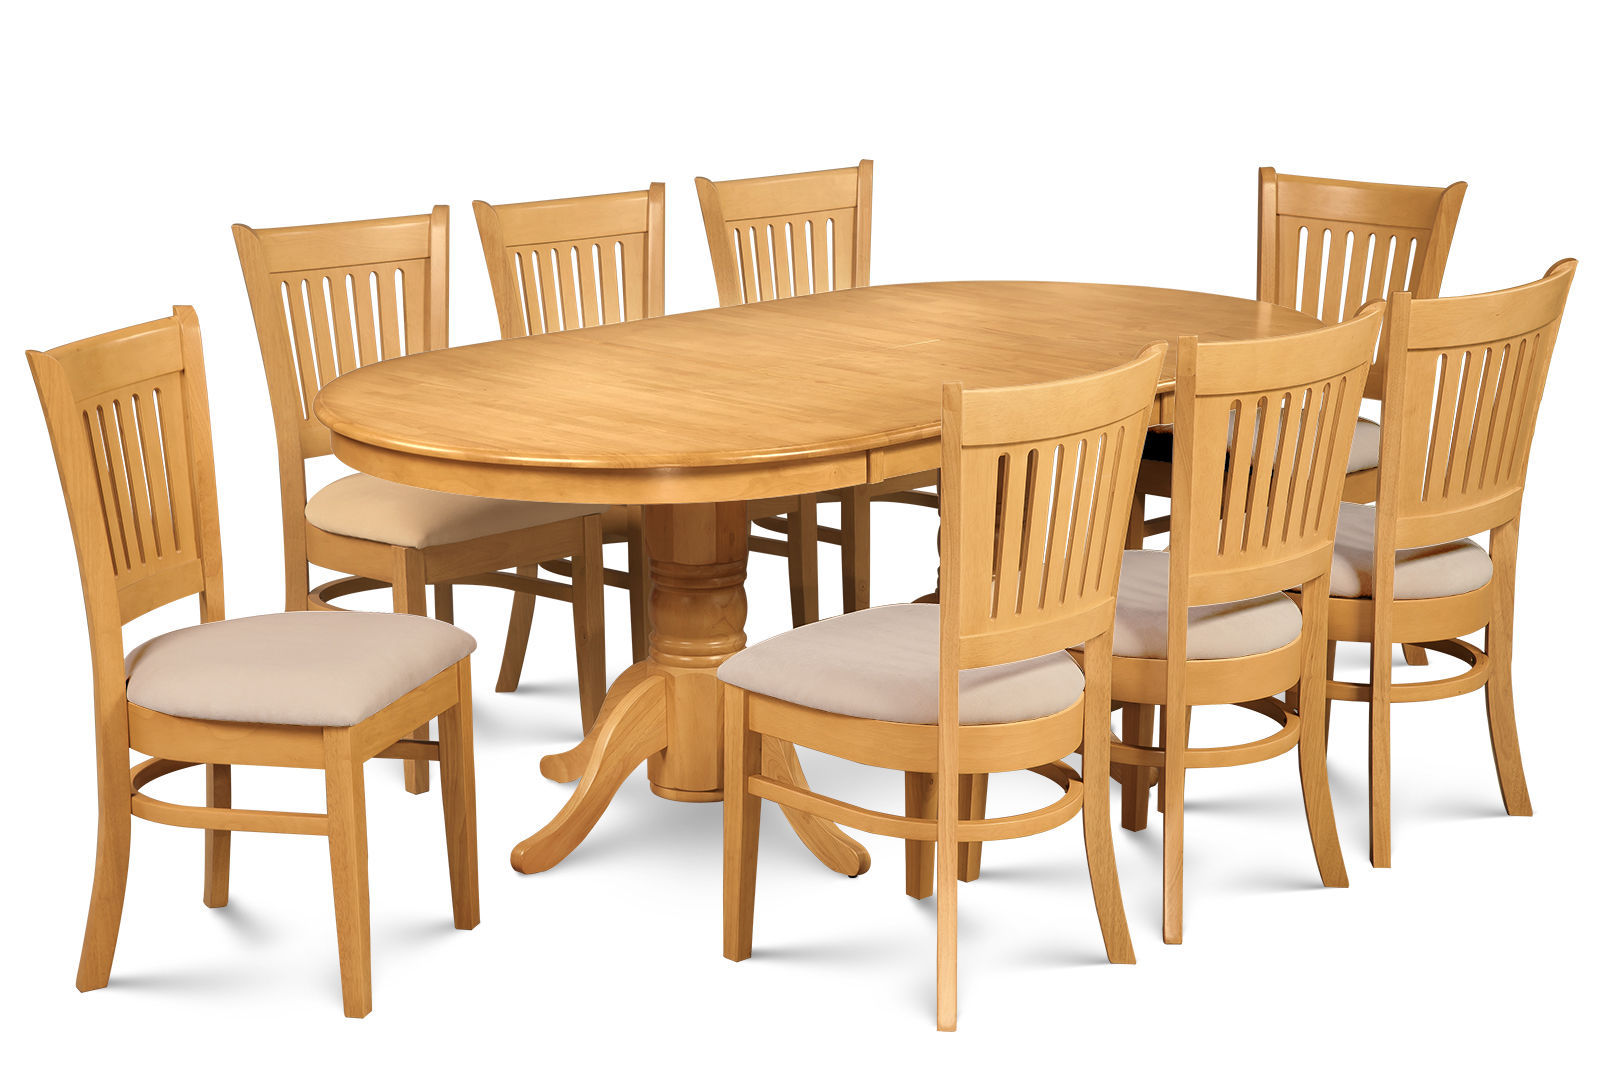 "SOMERVILLE DINETTE DINING ROOM TABLE SET 42""X78"" W. SOFT-PADPED SEATS IN OAK"